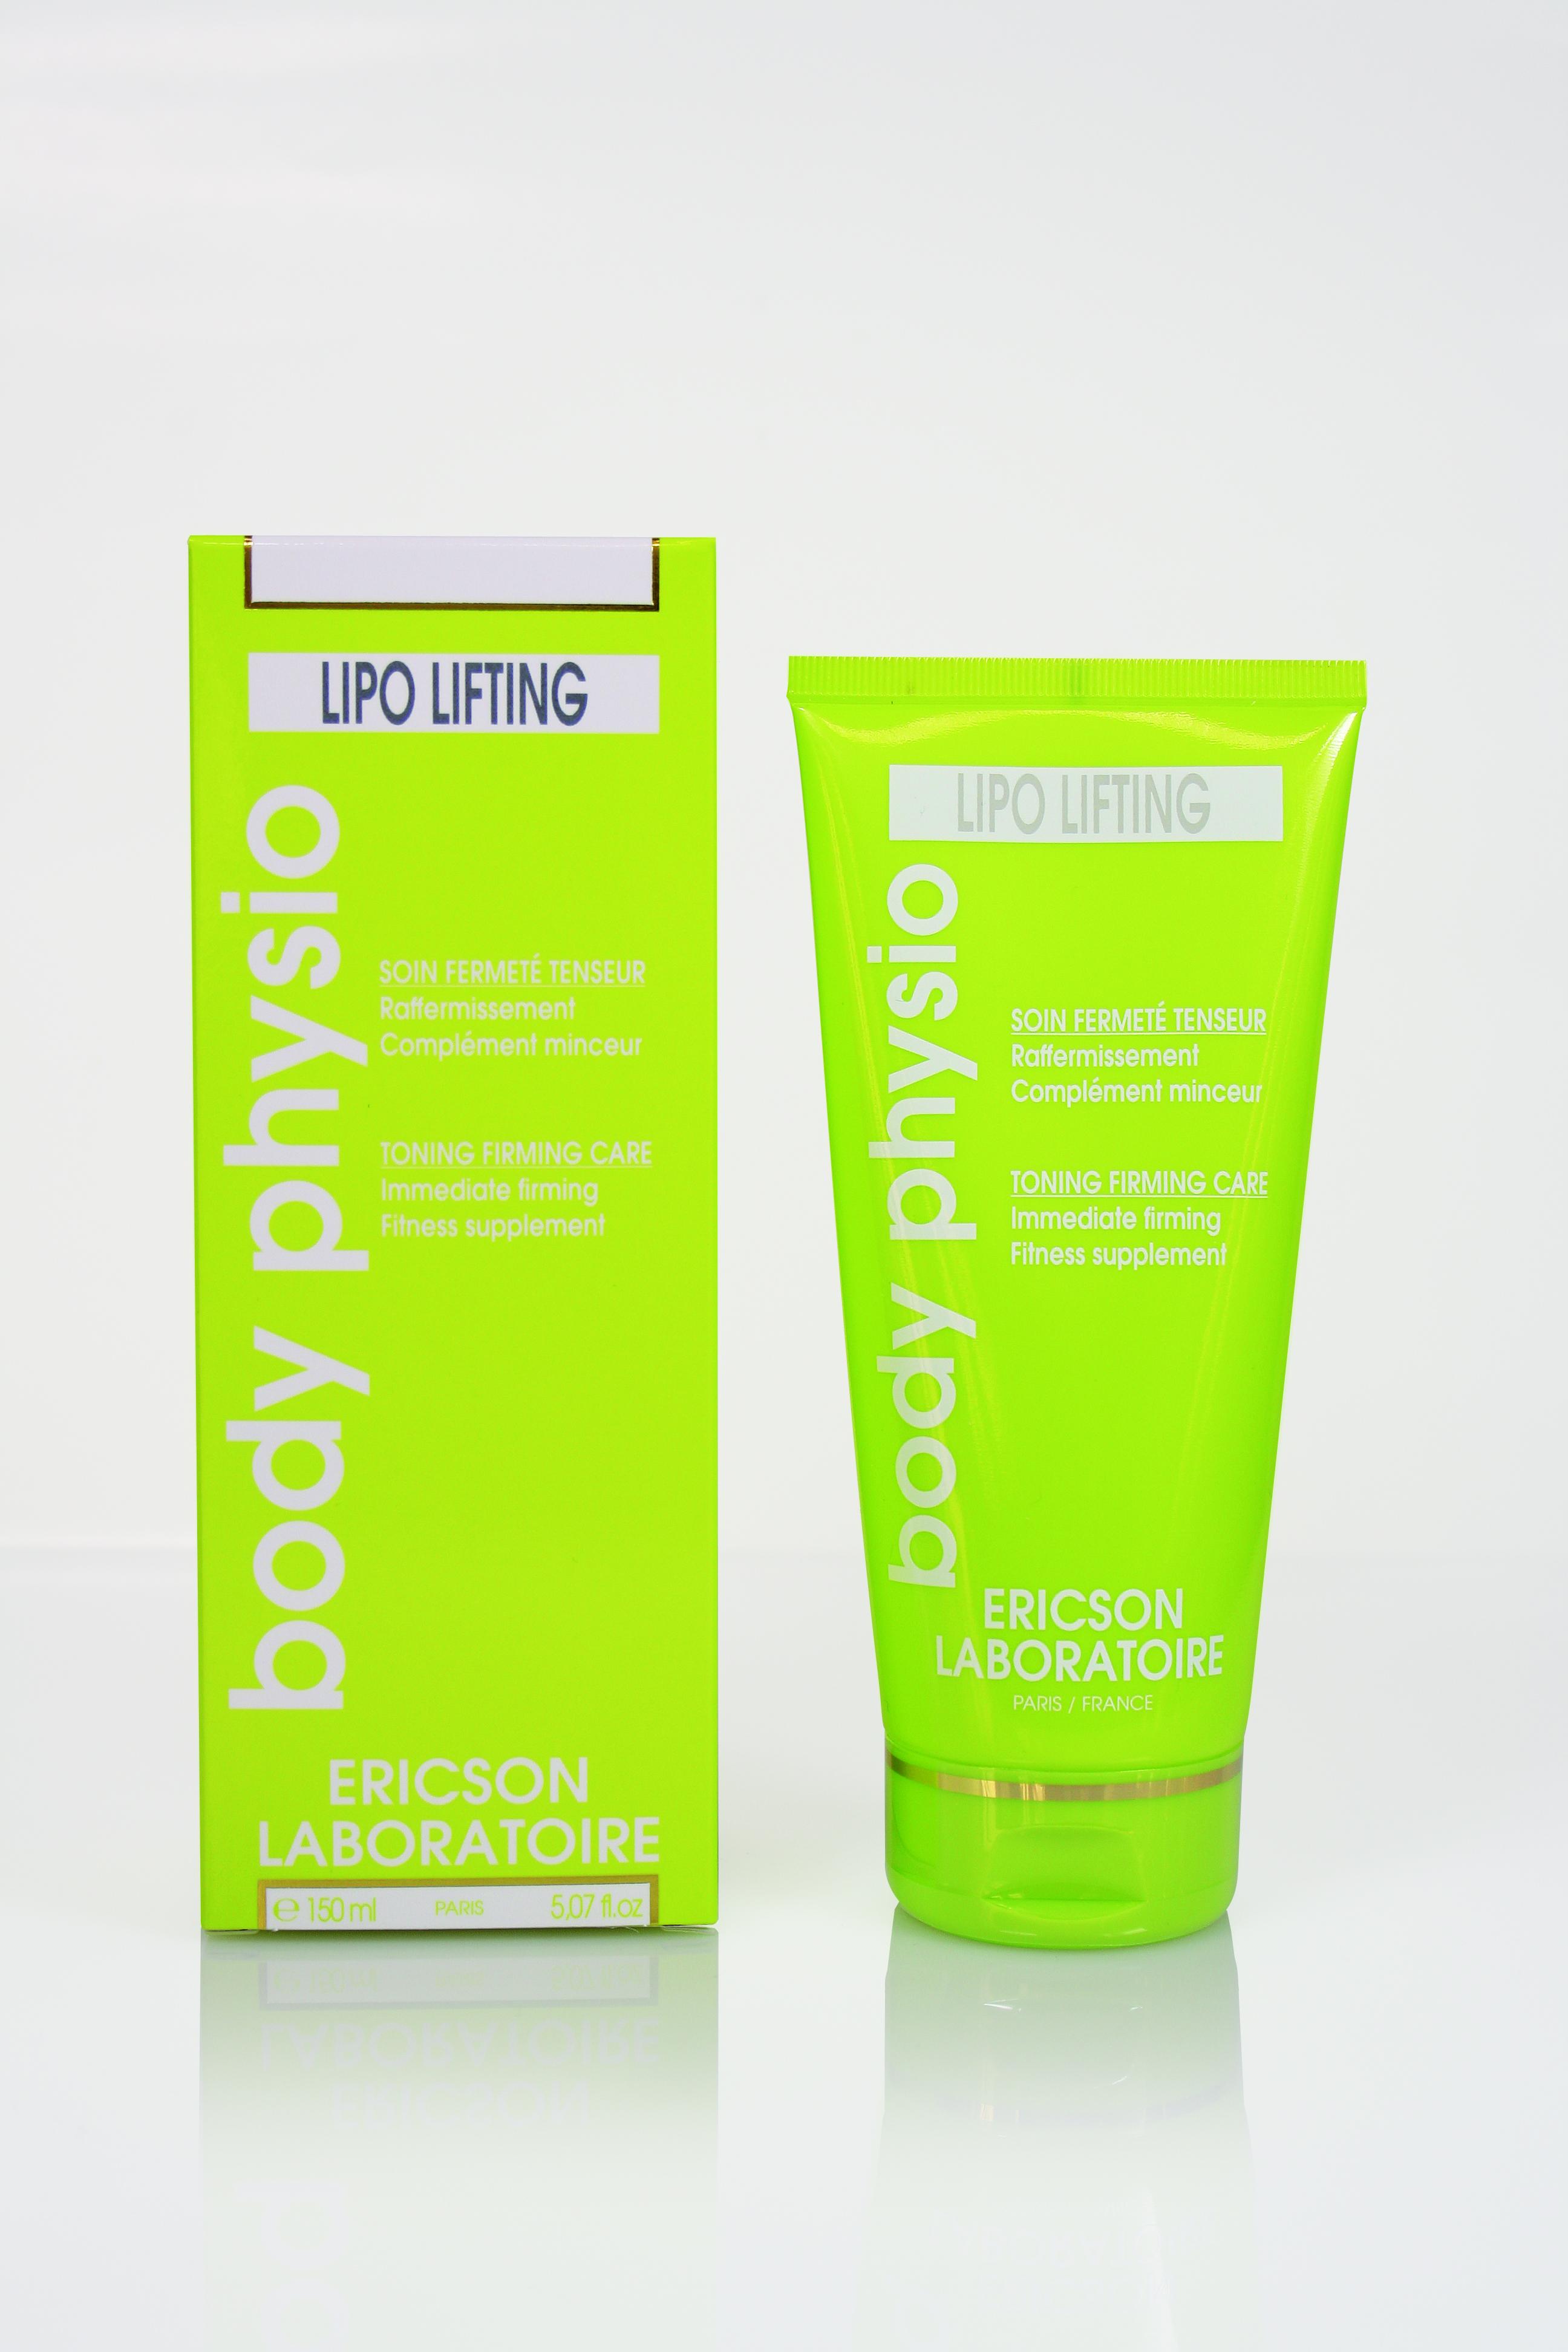 Lipo Lifting Body Physio Ericson